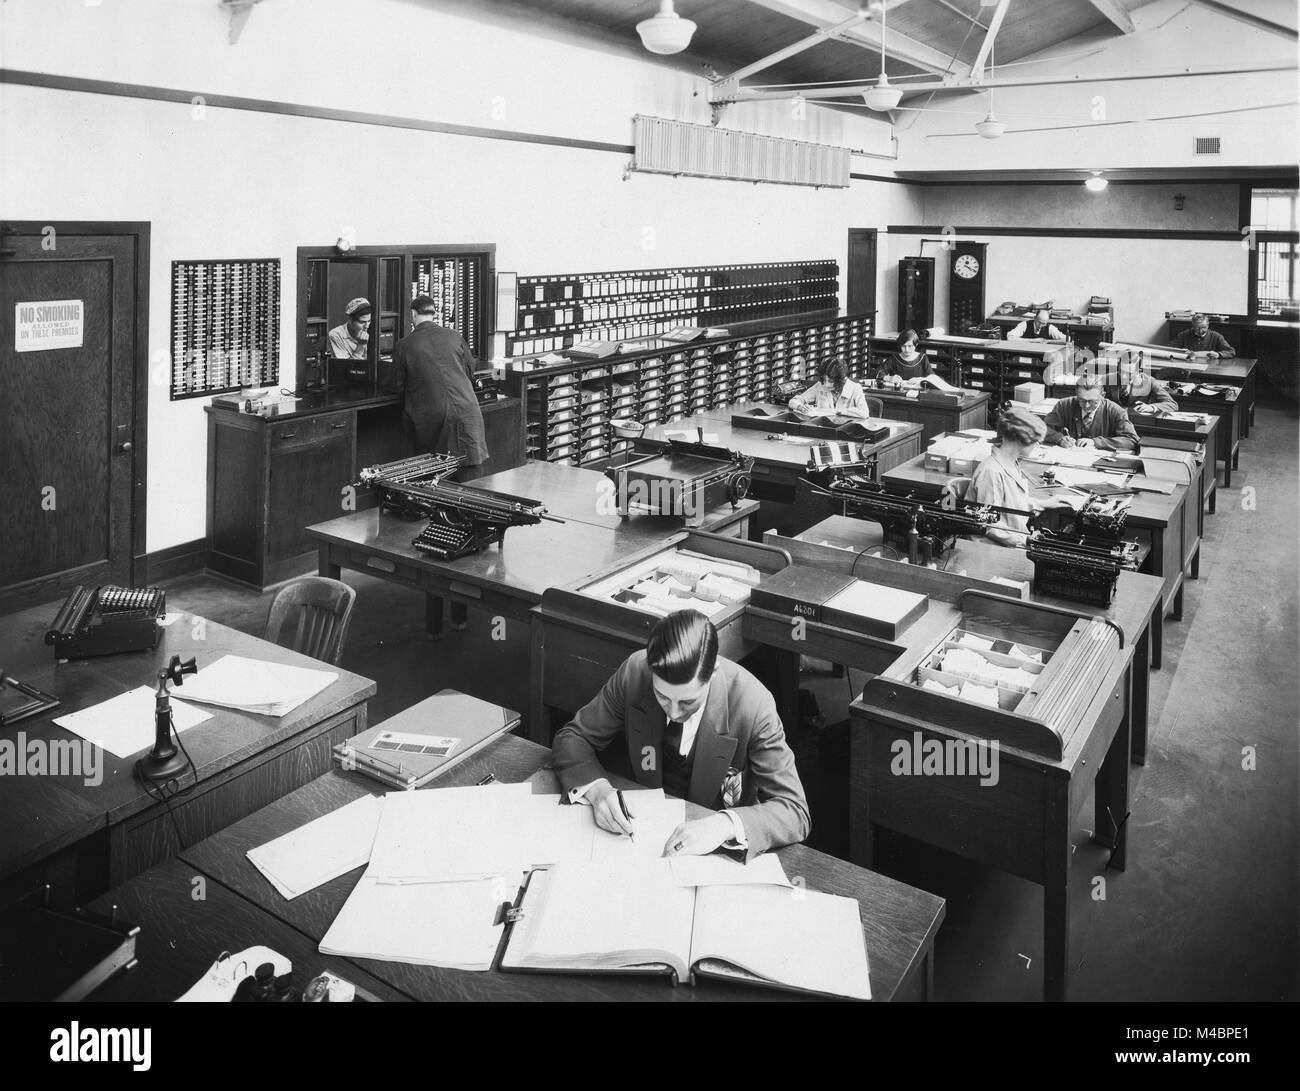 1940s Women Men Stock Photos & 1940s Women Men Stock Images - Alamy